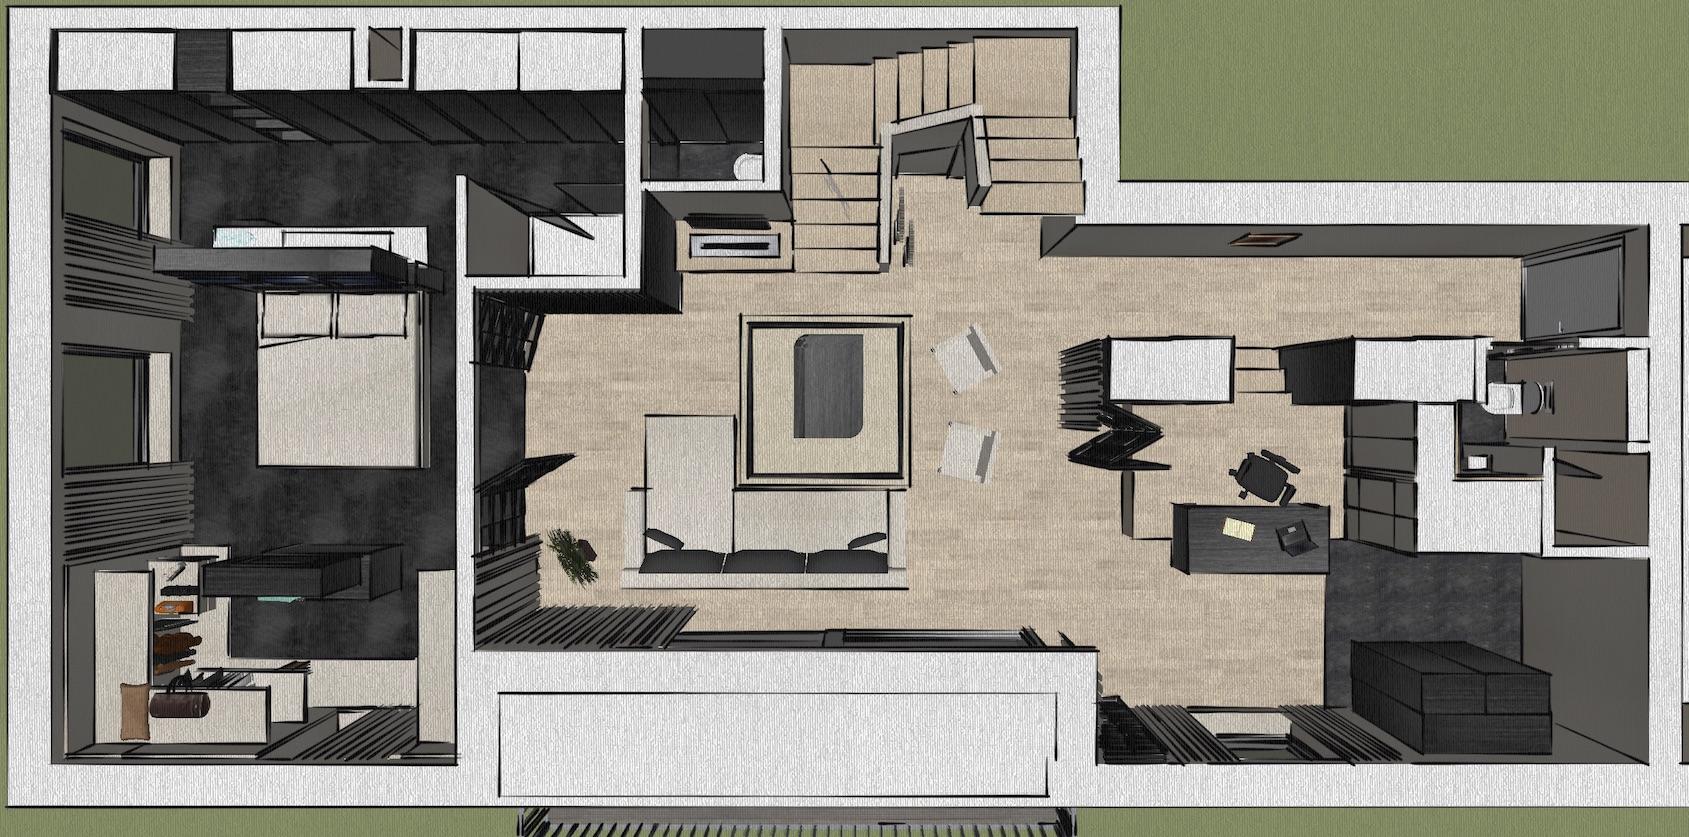 Academia duplex grondplan beneden